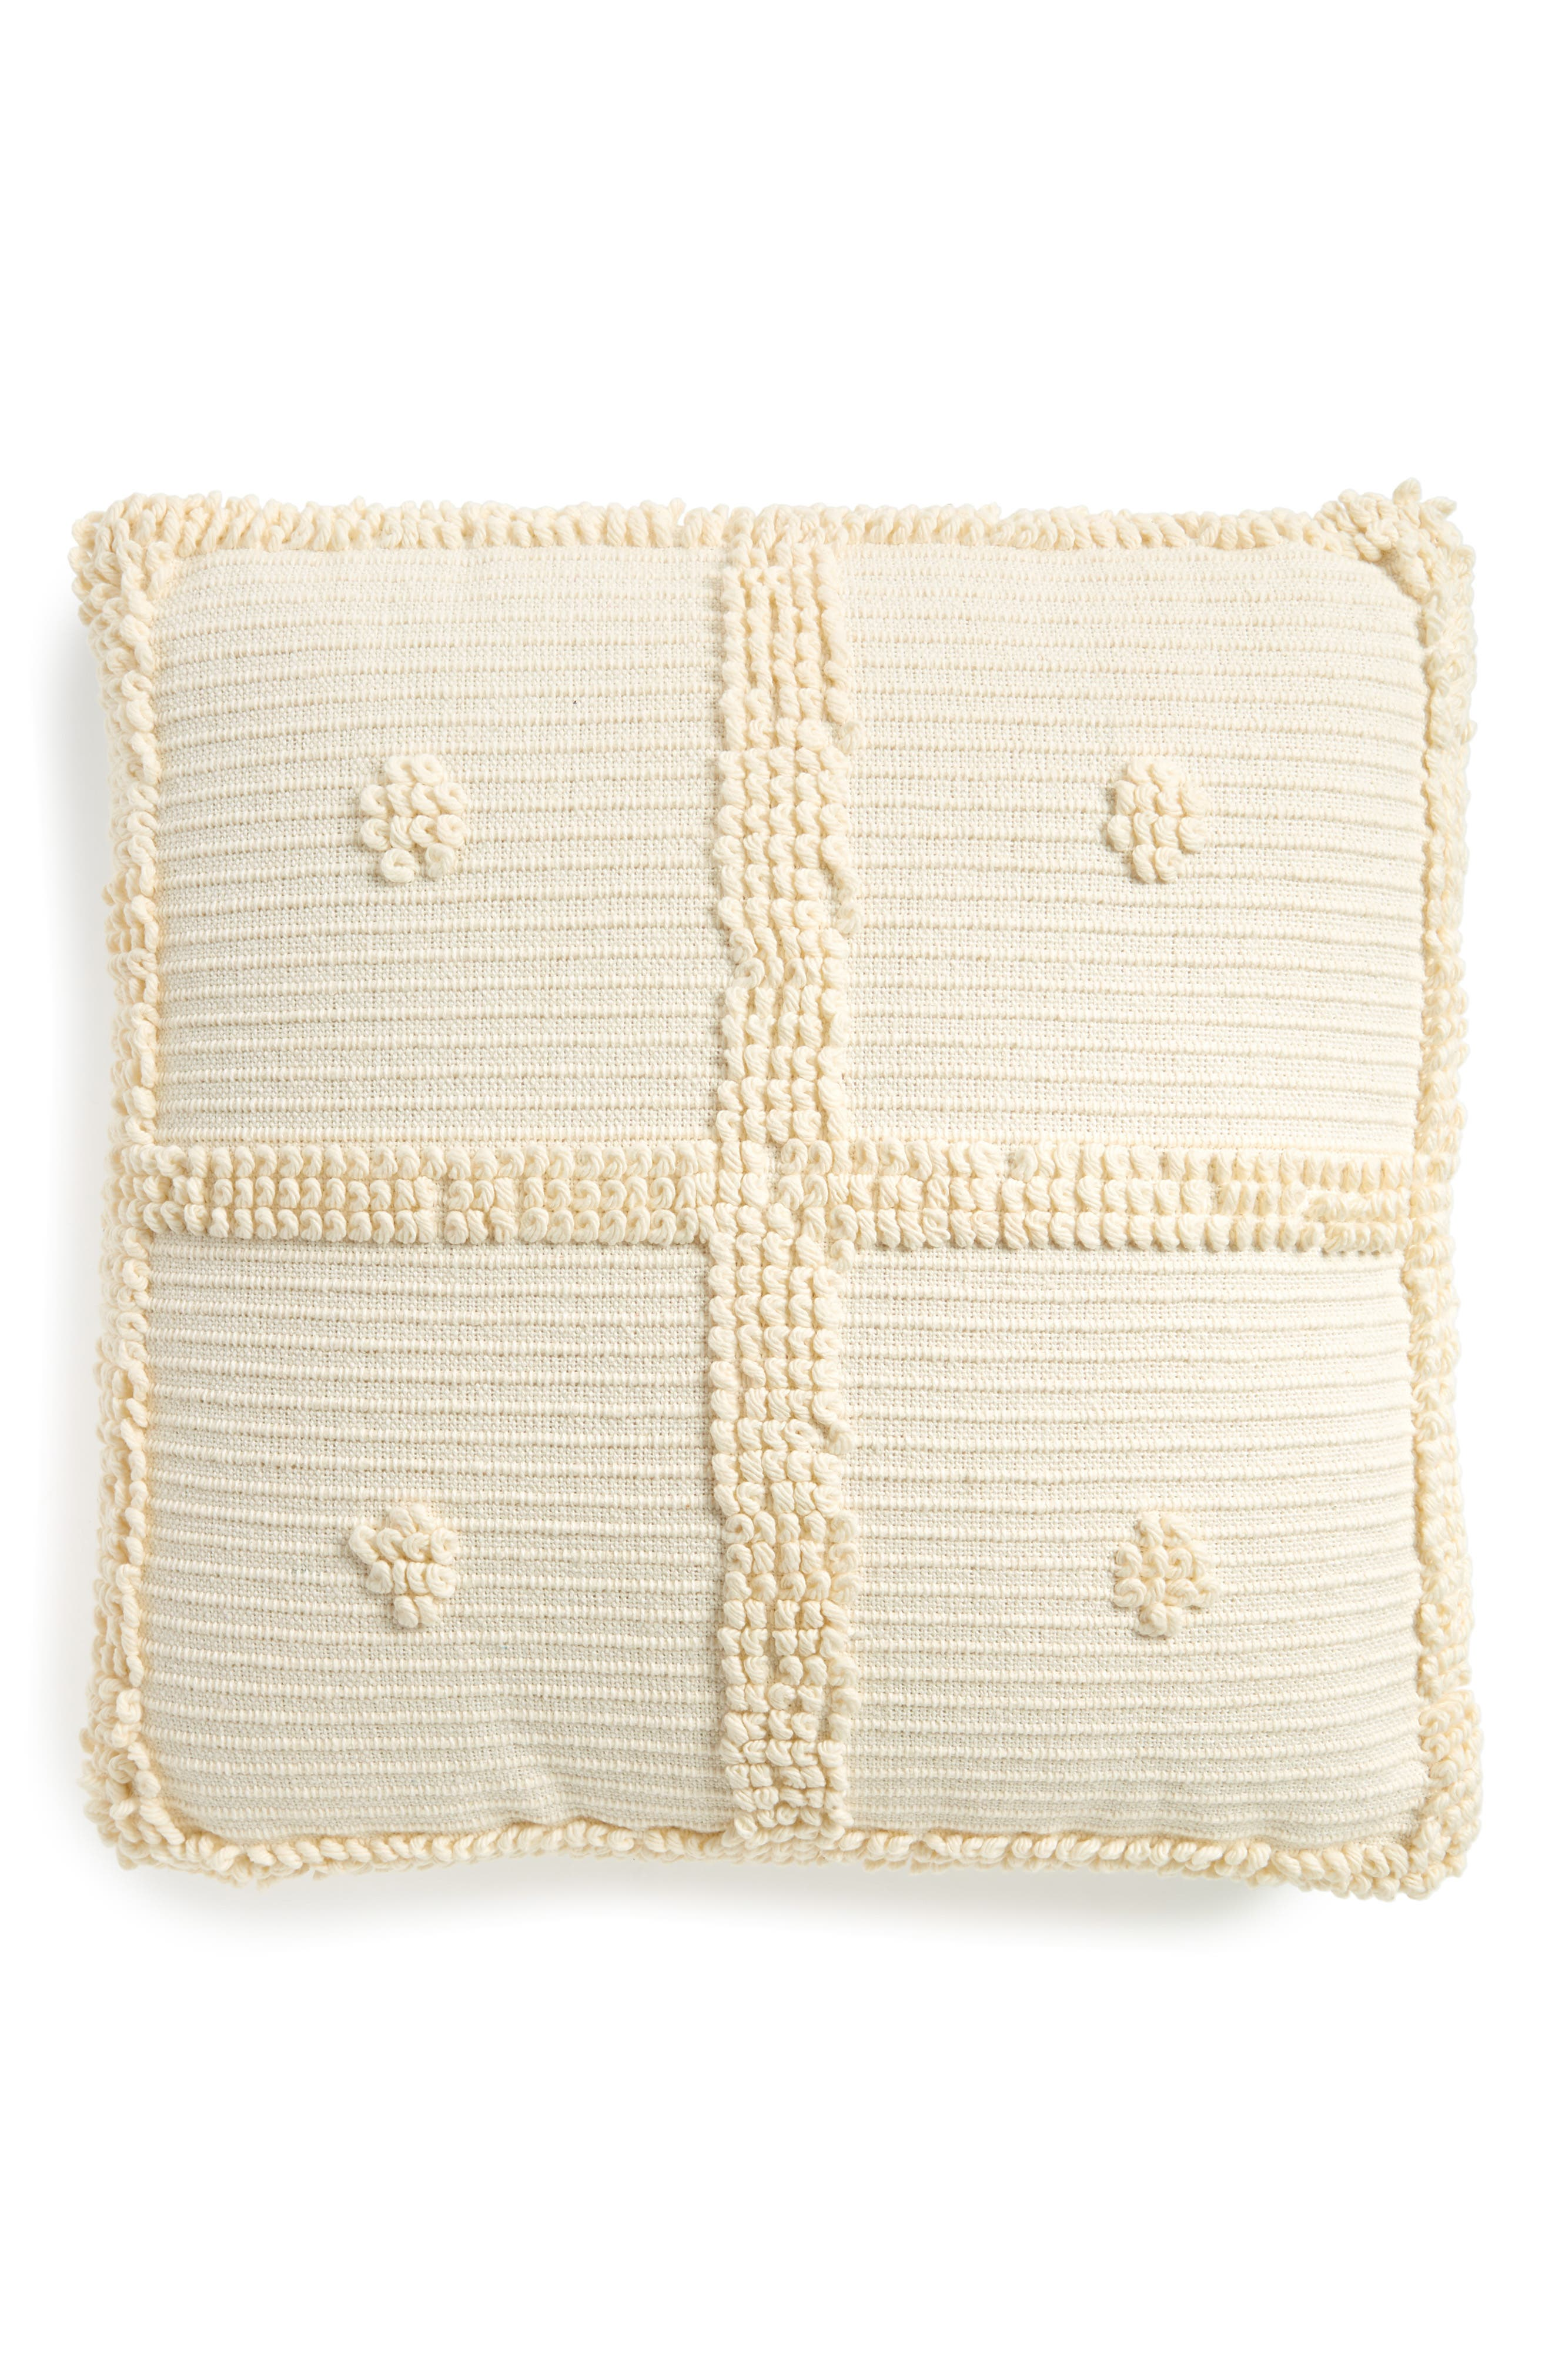 Square Accent Pillow,                         Main,                         color, 100